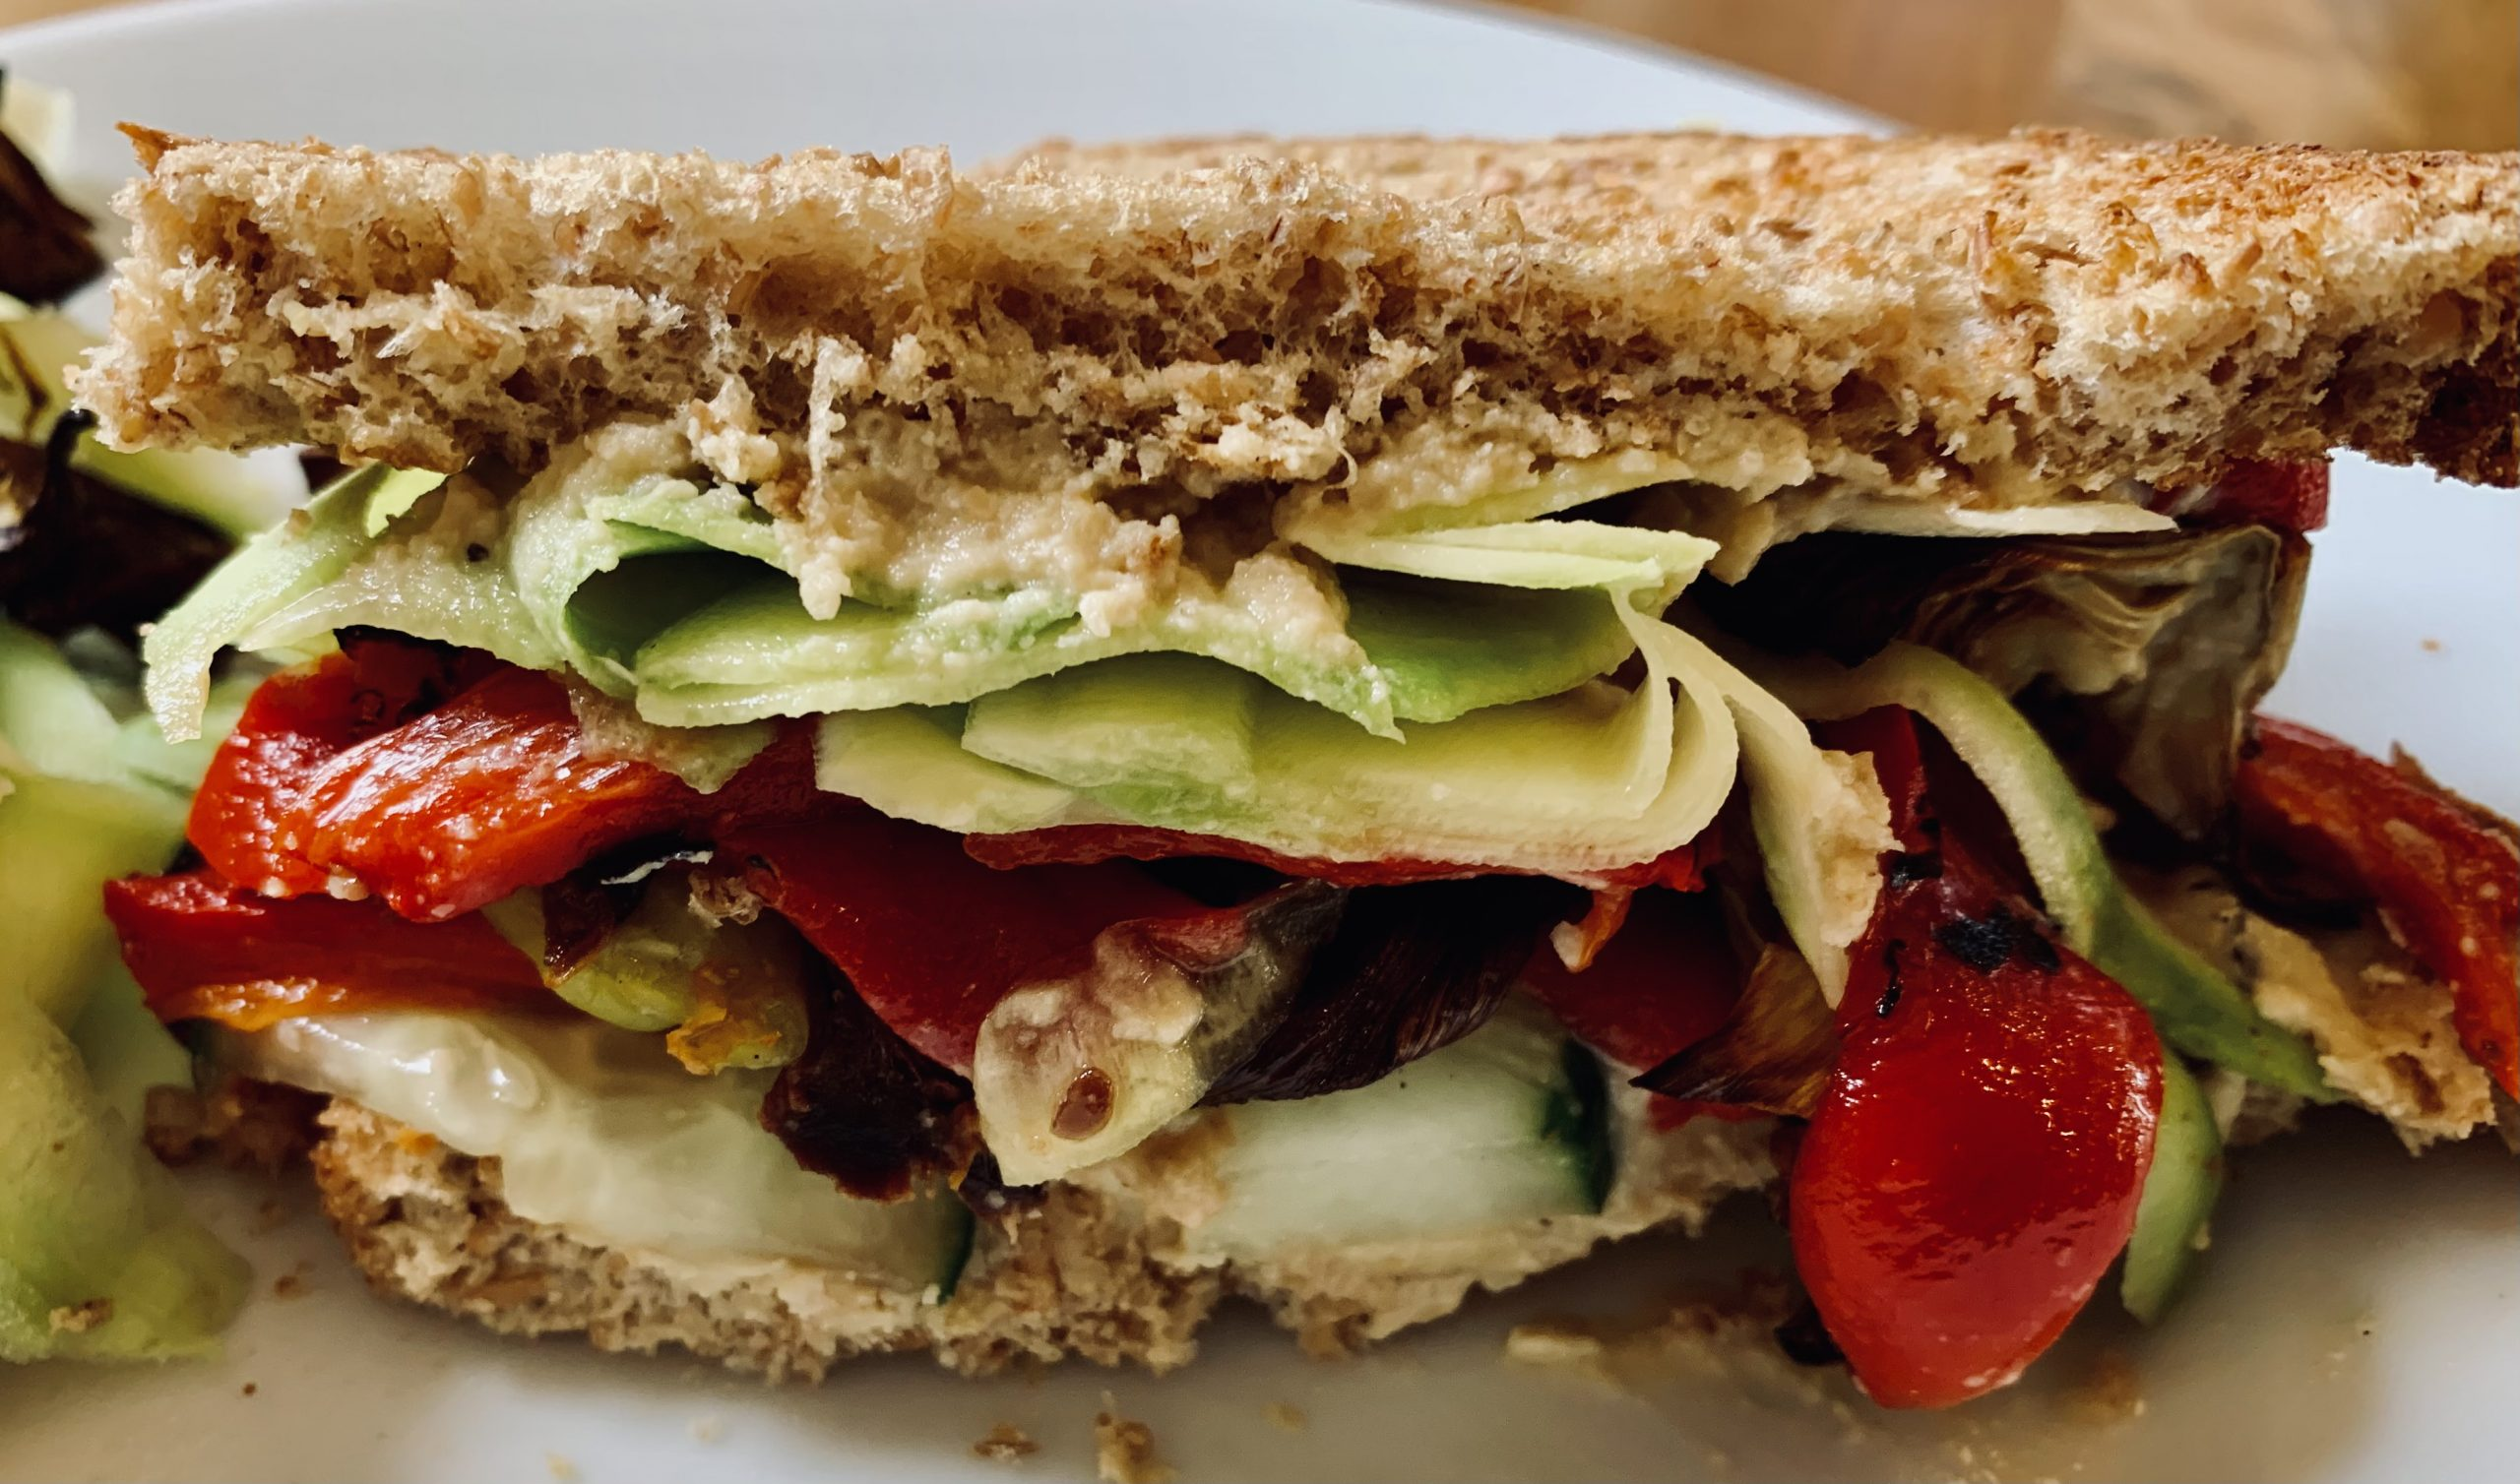 My Big Fat Greek Sandwich